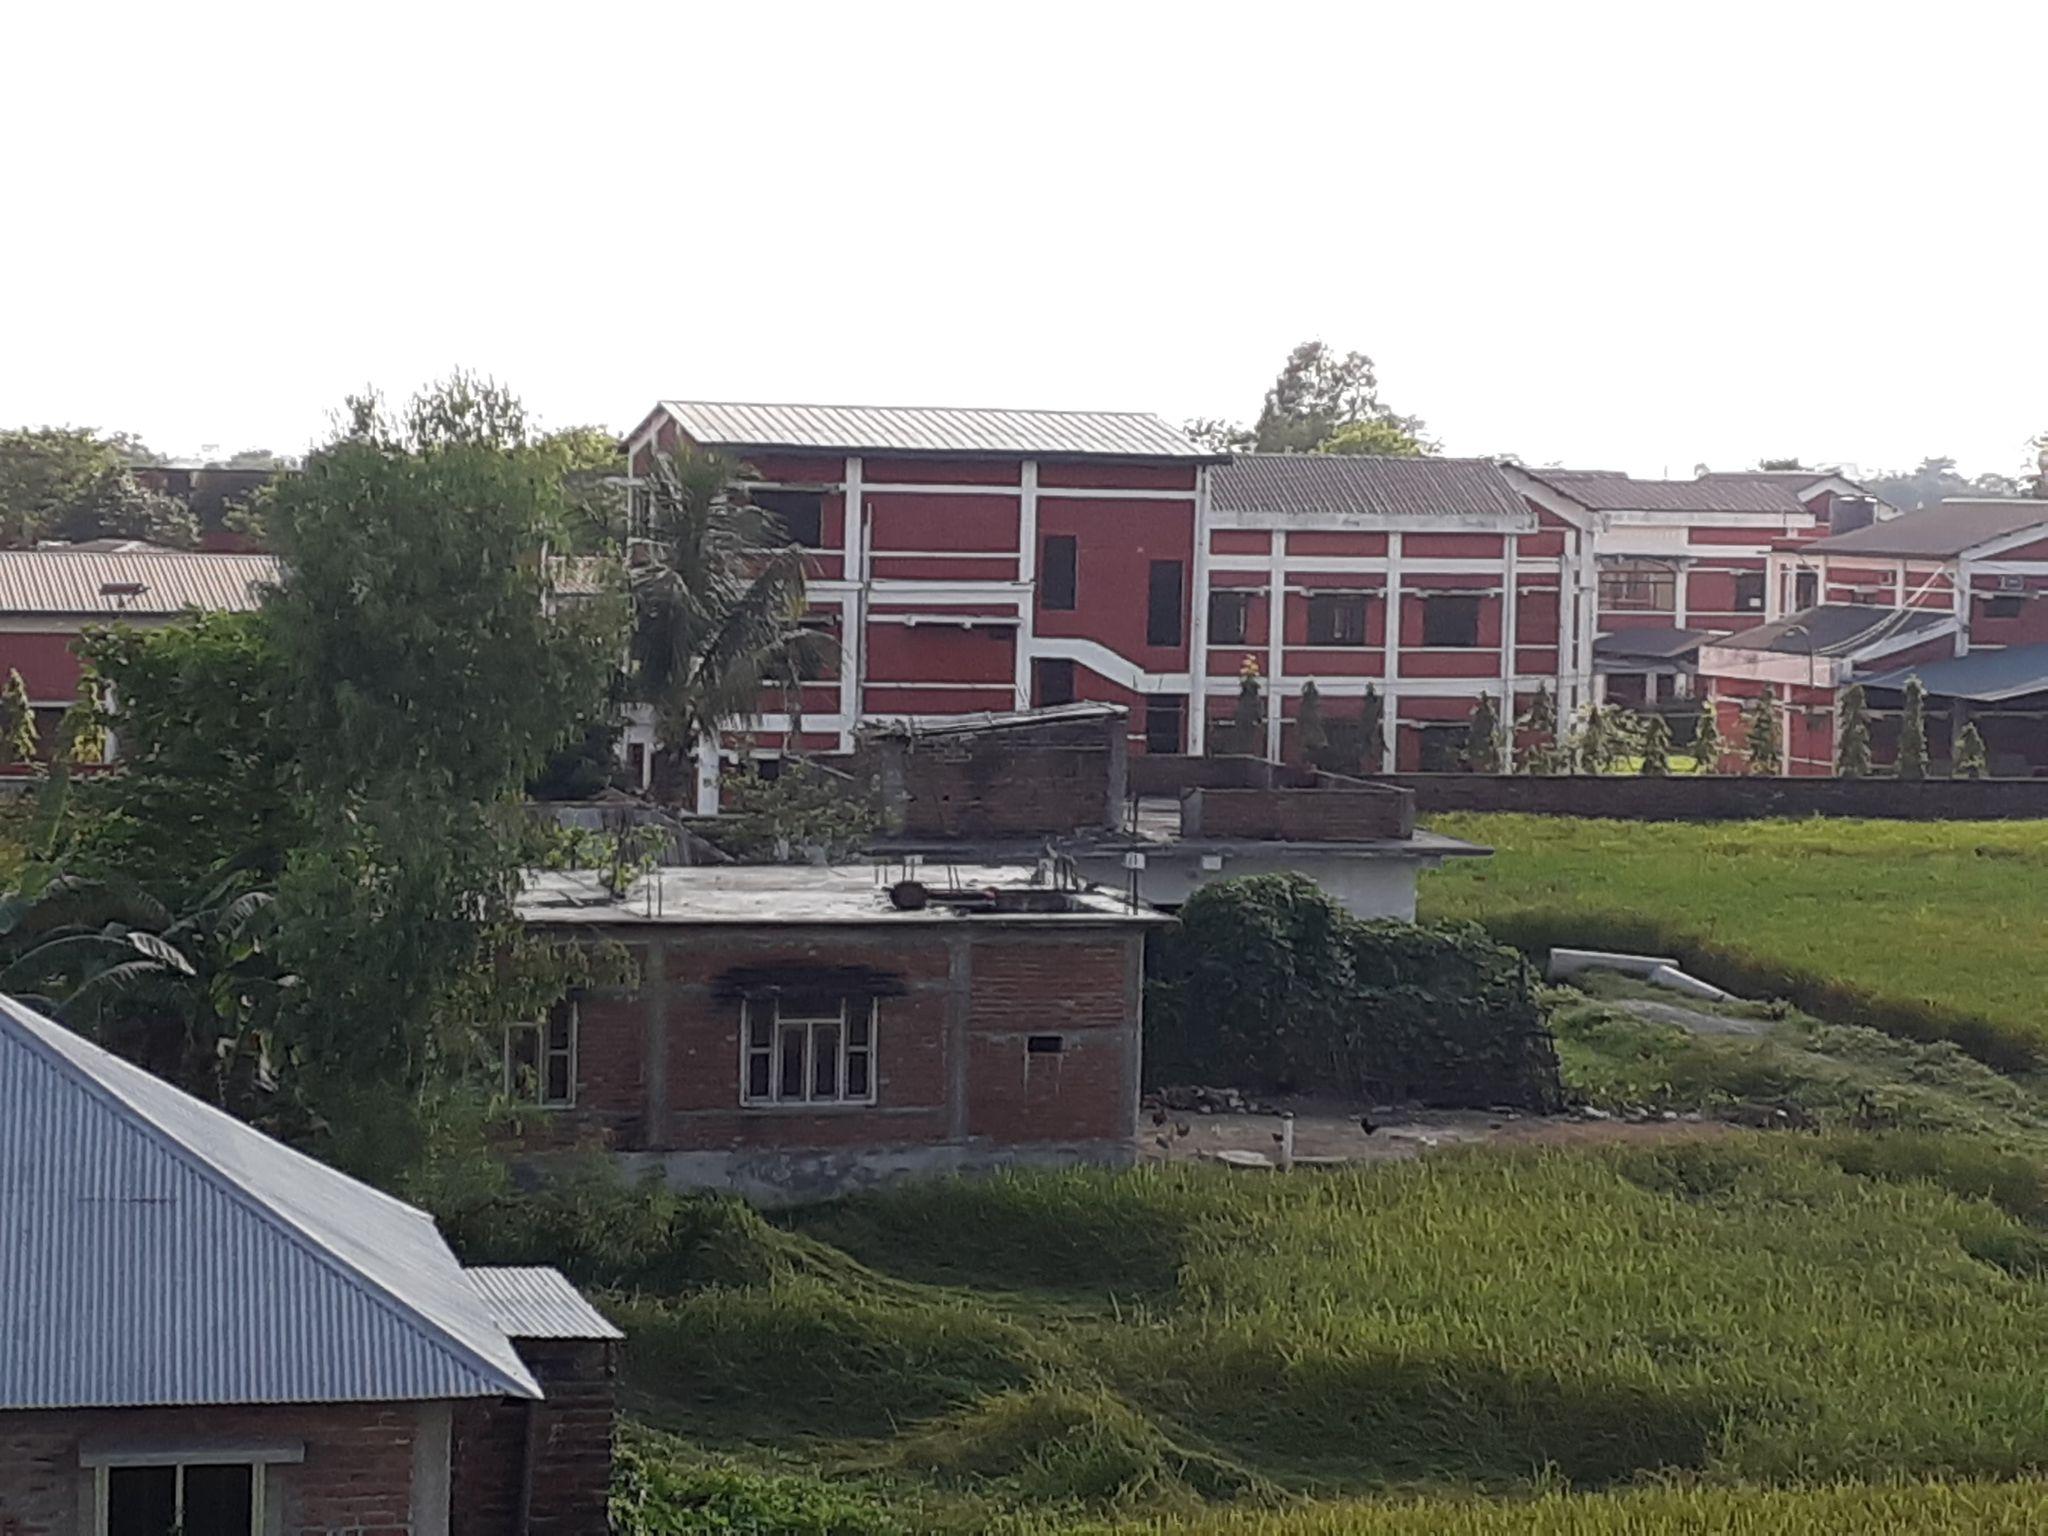 मनमोहन विश्वविद्यालयमै निर्माण सामग्रीको गुणस्तर परीक्षण